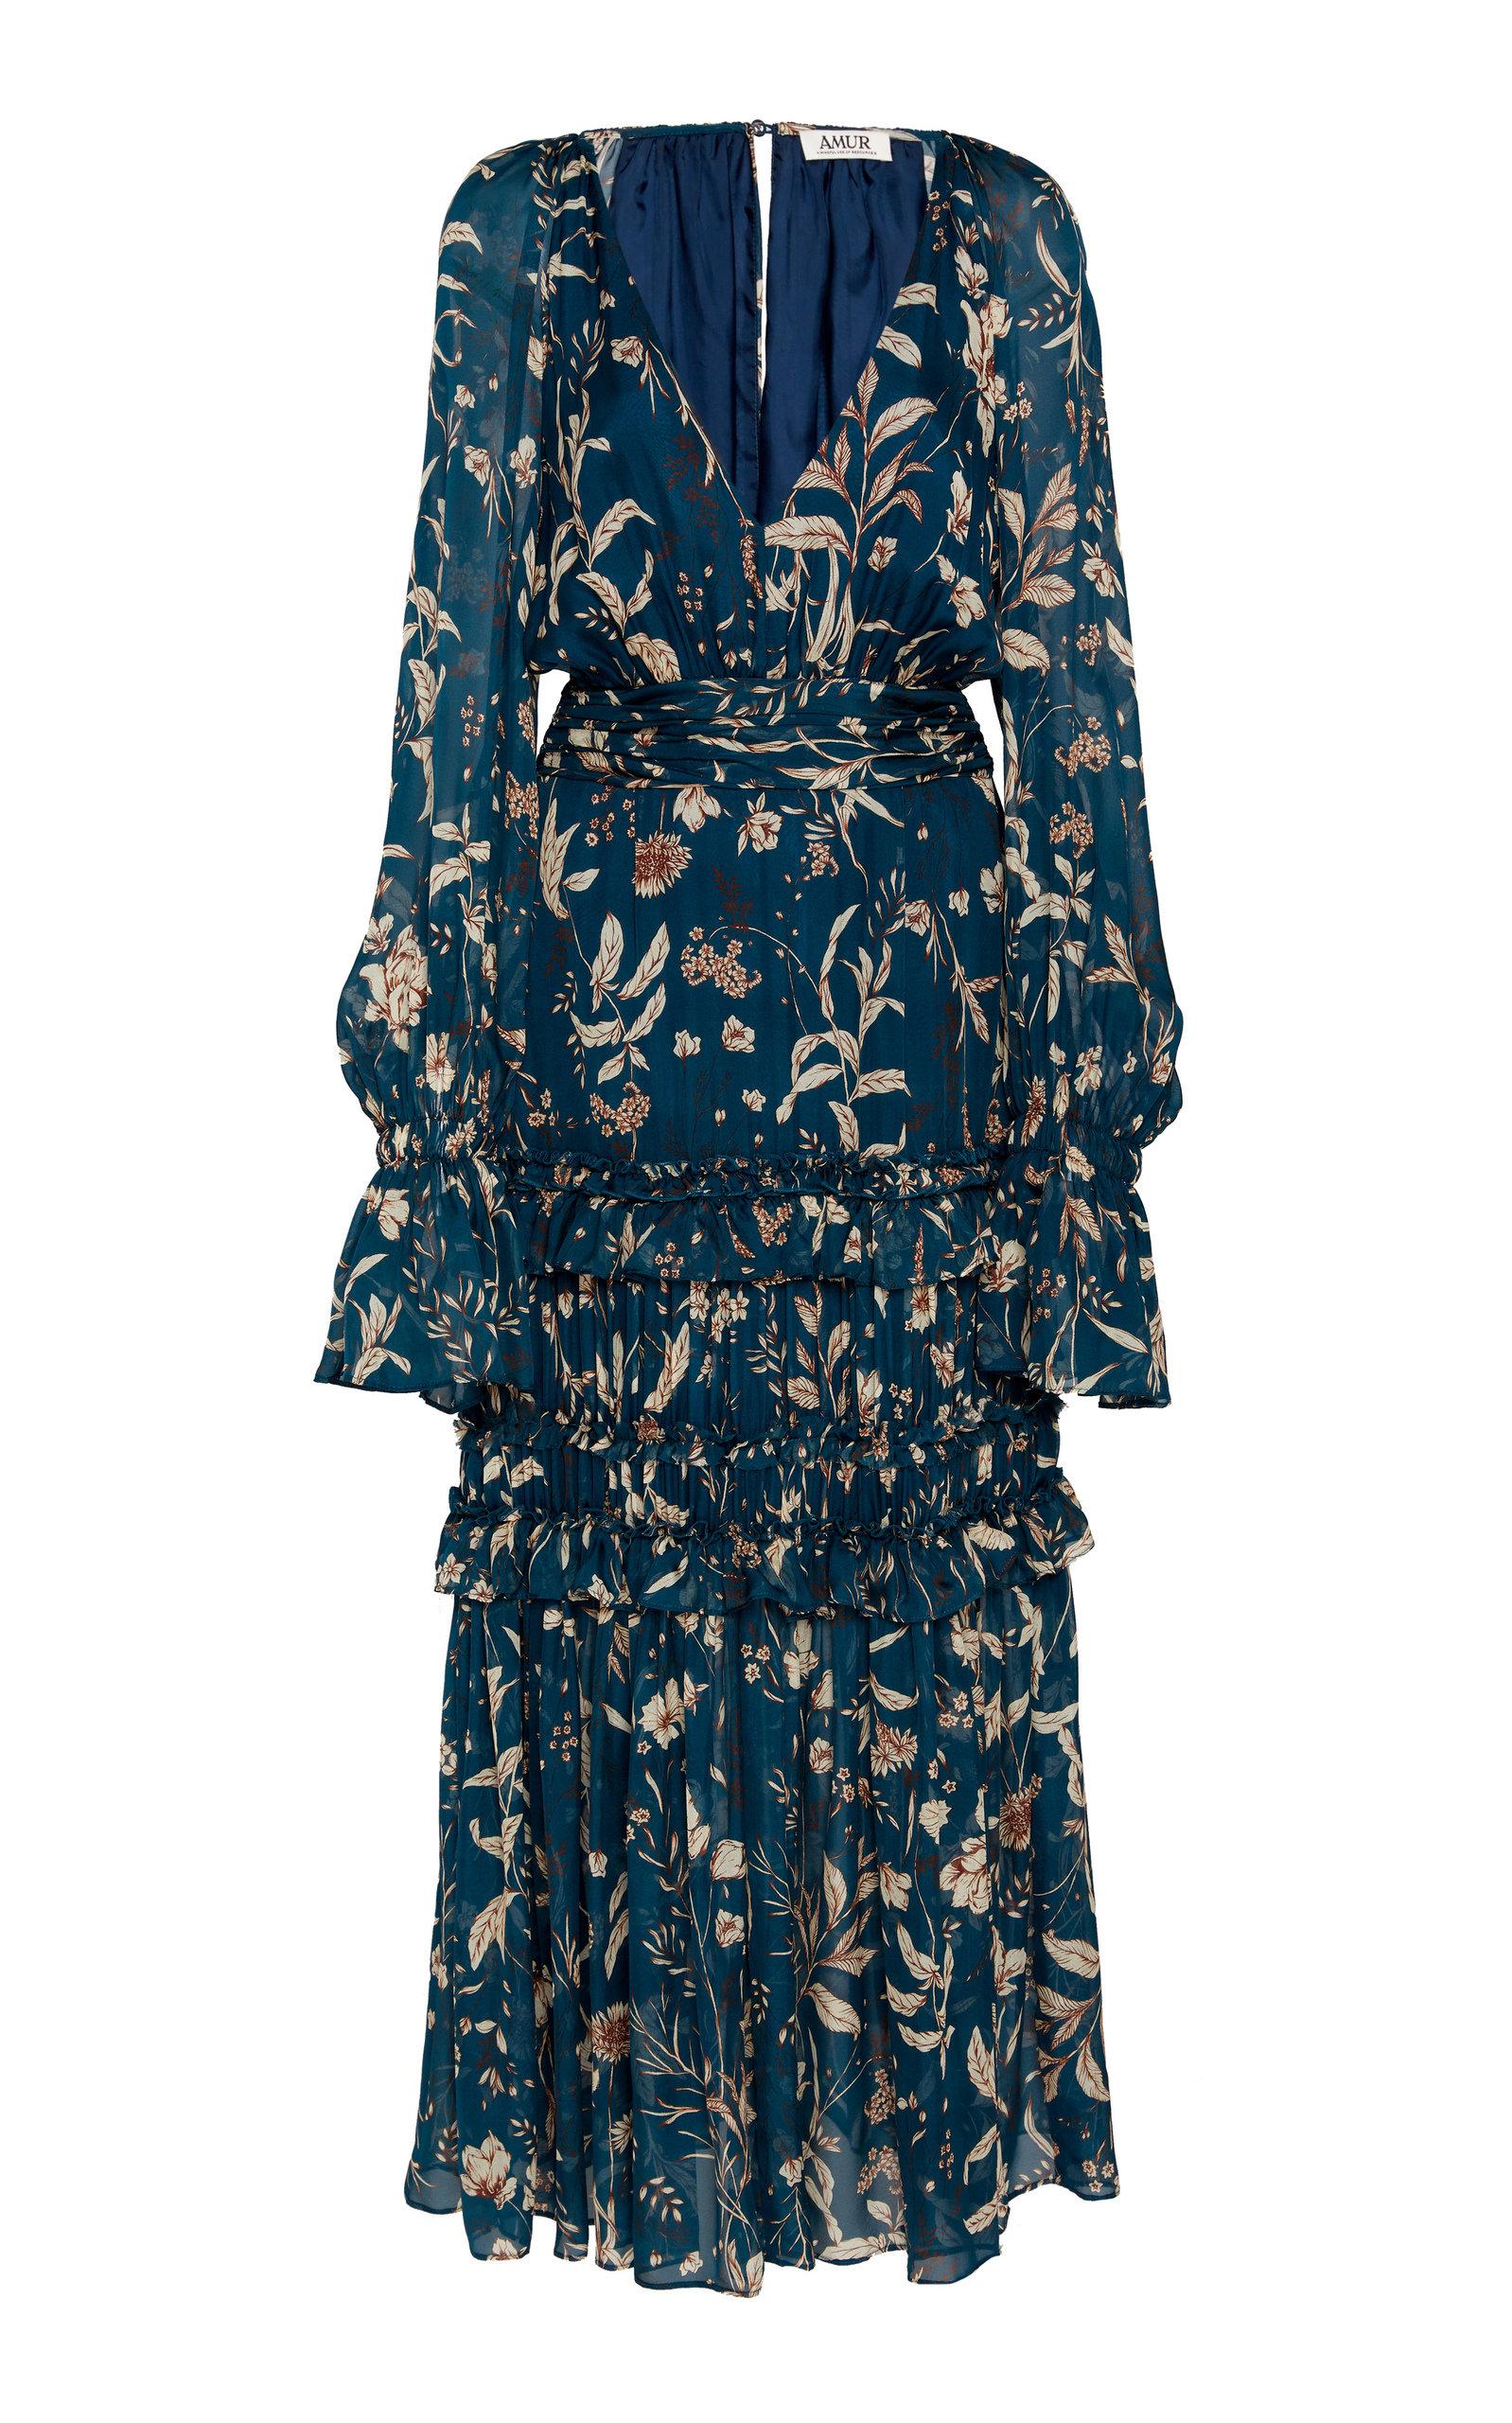 Buy AMUR Reah Printed Ruffled V-Neck Silk Dress online, shop AMUR at the best price